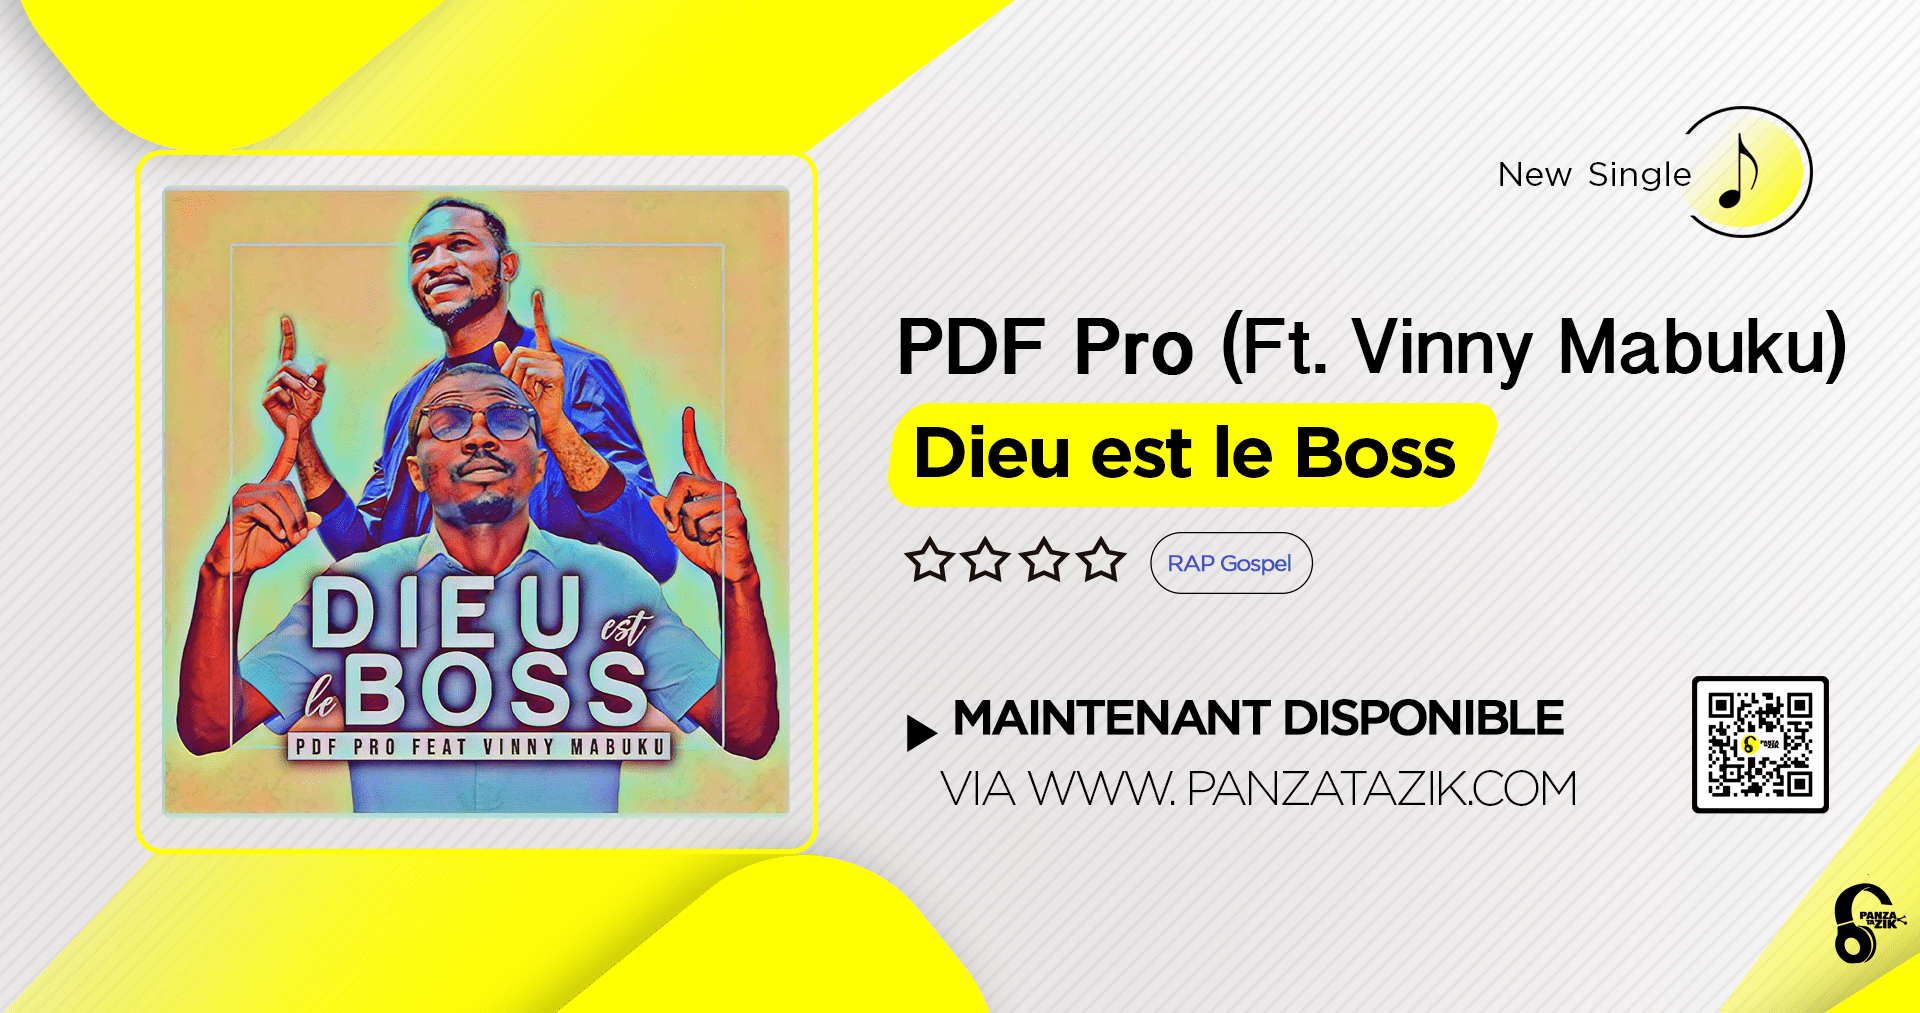 Pdf Pro – Dieu est le Boss (Ft. Vinny Mabuku)